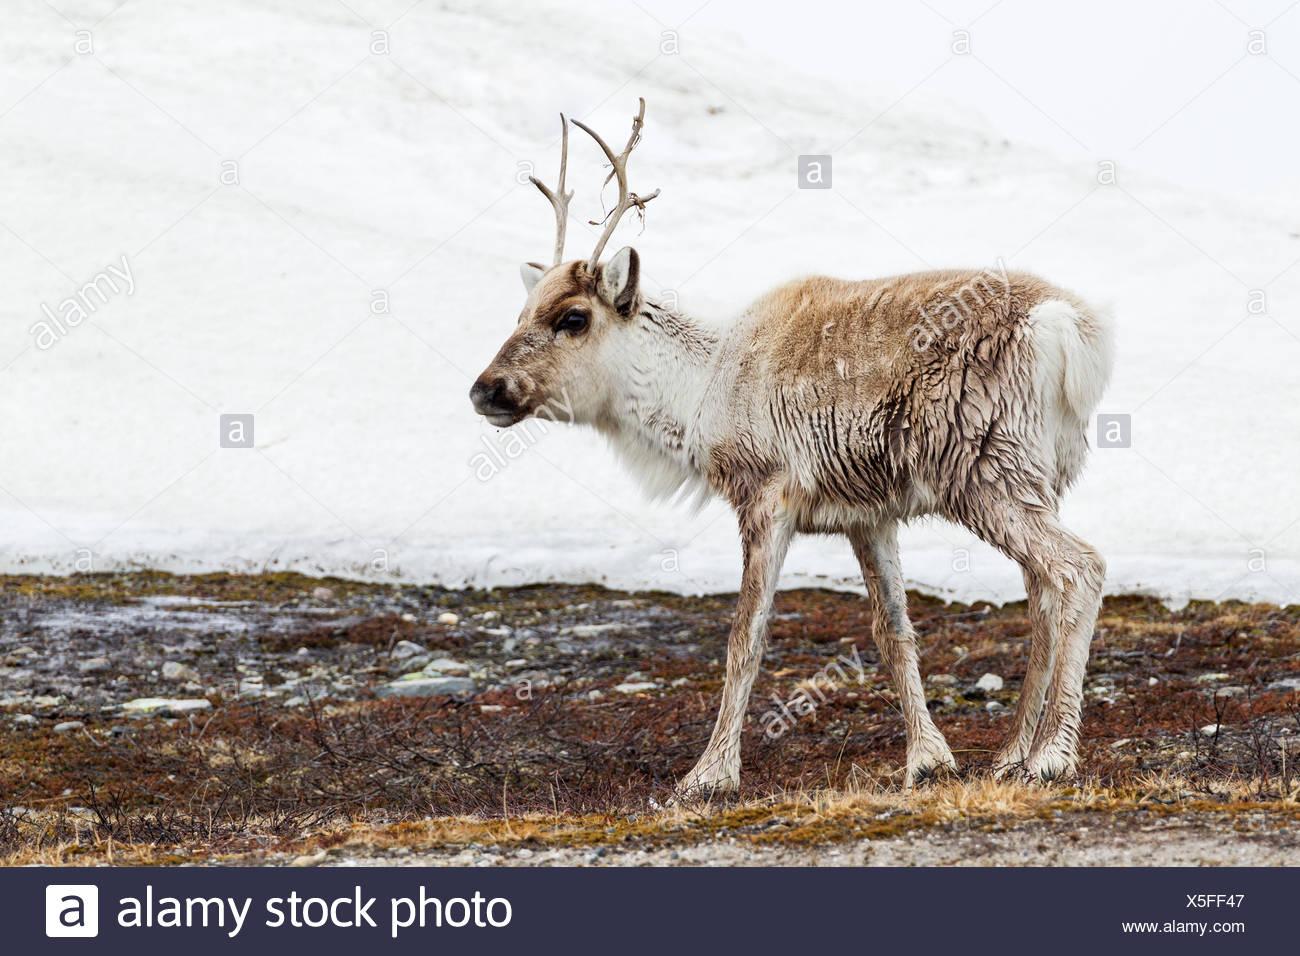 Reindeer (Rangifer tarandus), calf  in snowdrift - Stock Image